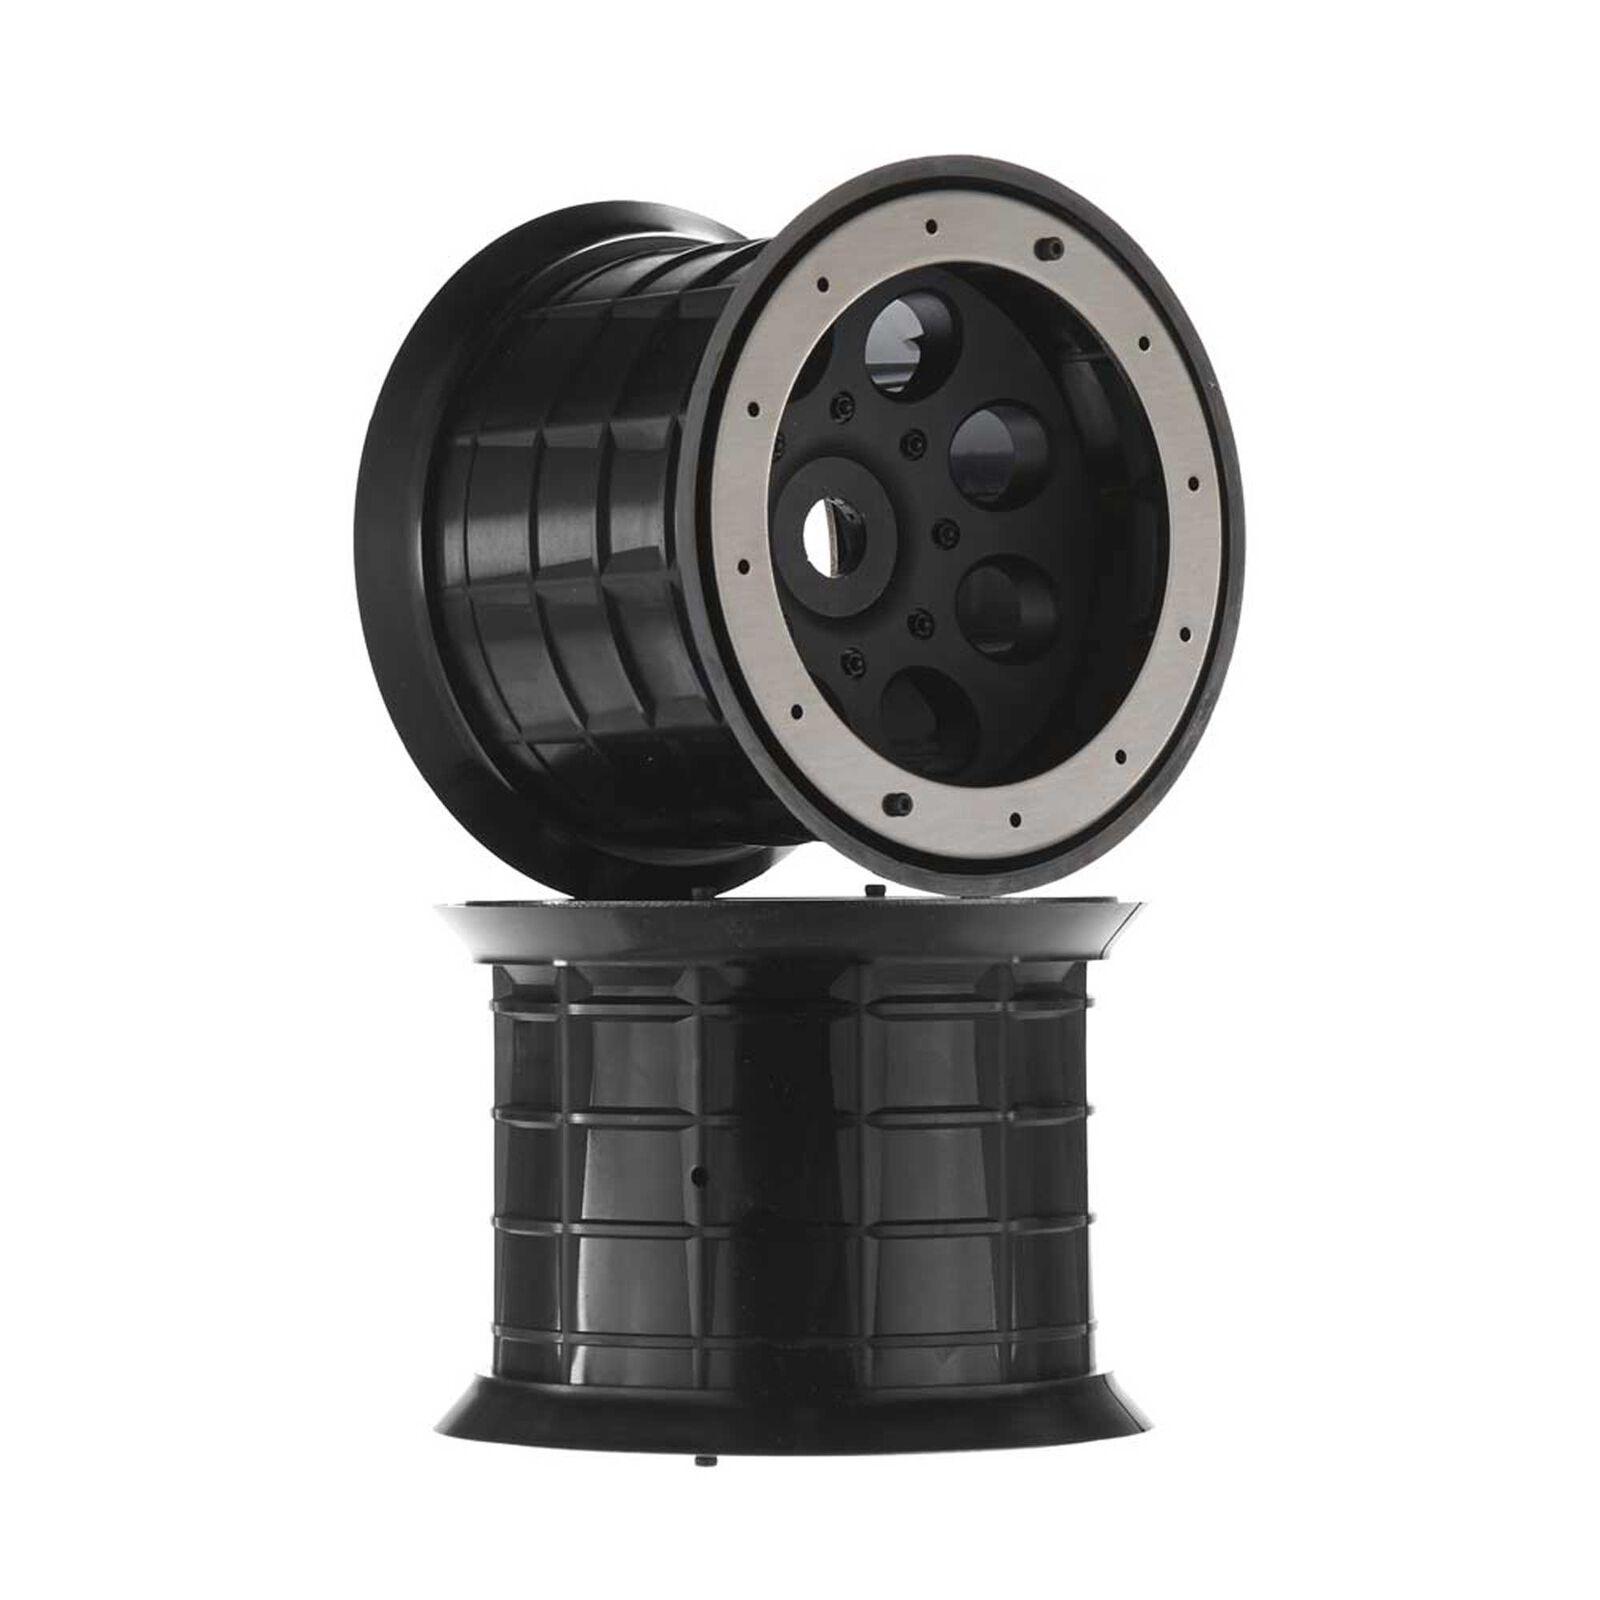 1/8 Oversize 8-Hole 3.8 Beadlock Wheels, 17mm Hex, Black (2)